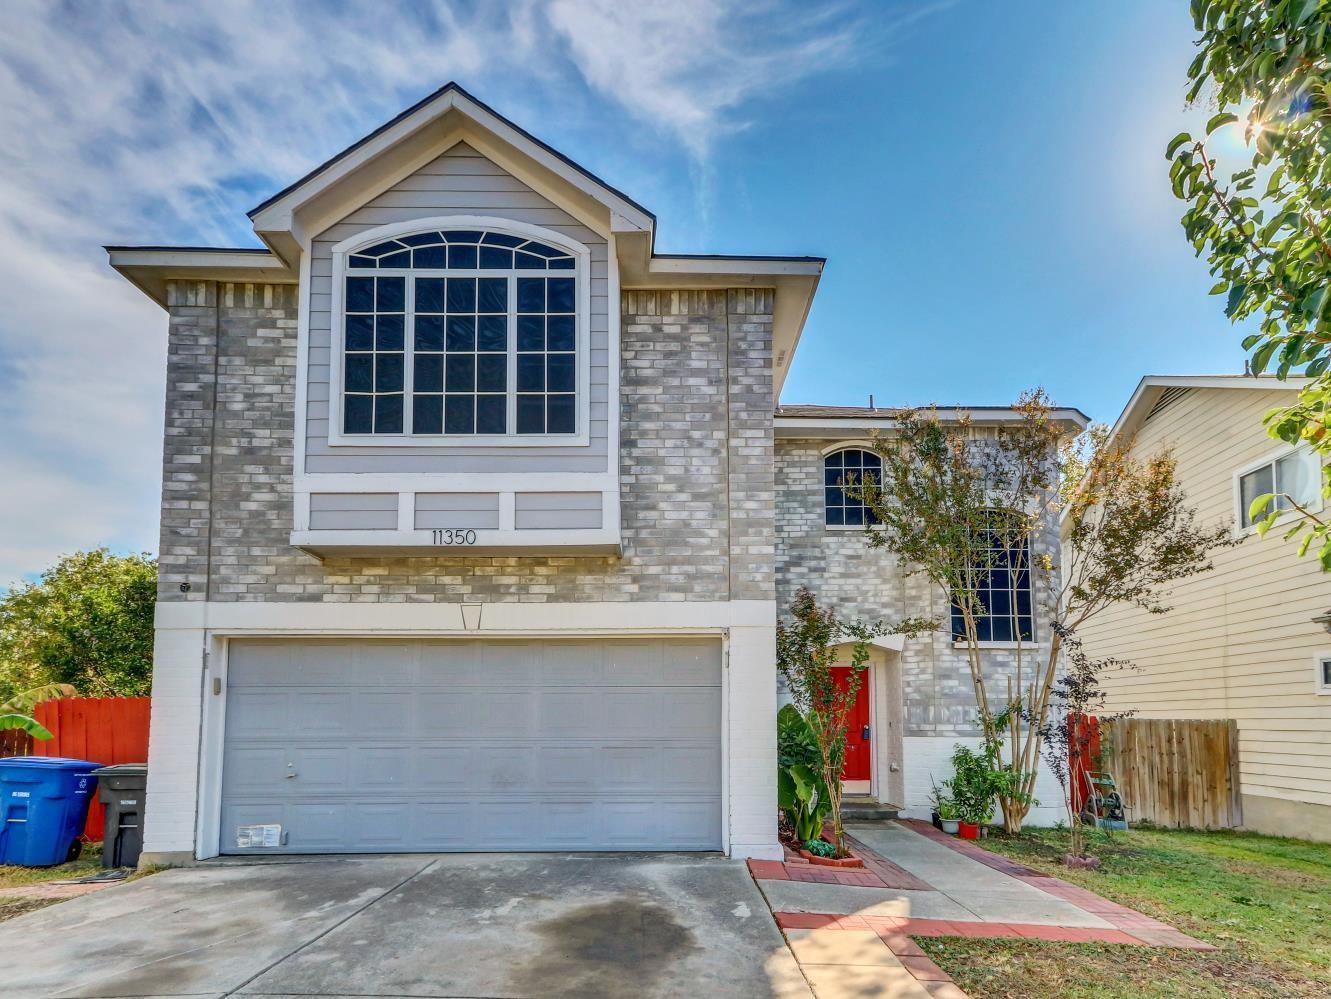 11350 Enclave Run Property Photo - San Antonio, TX real estate listing